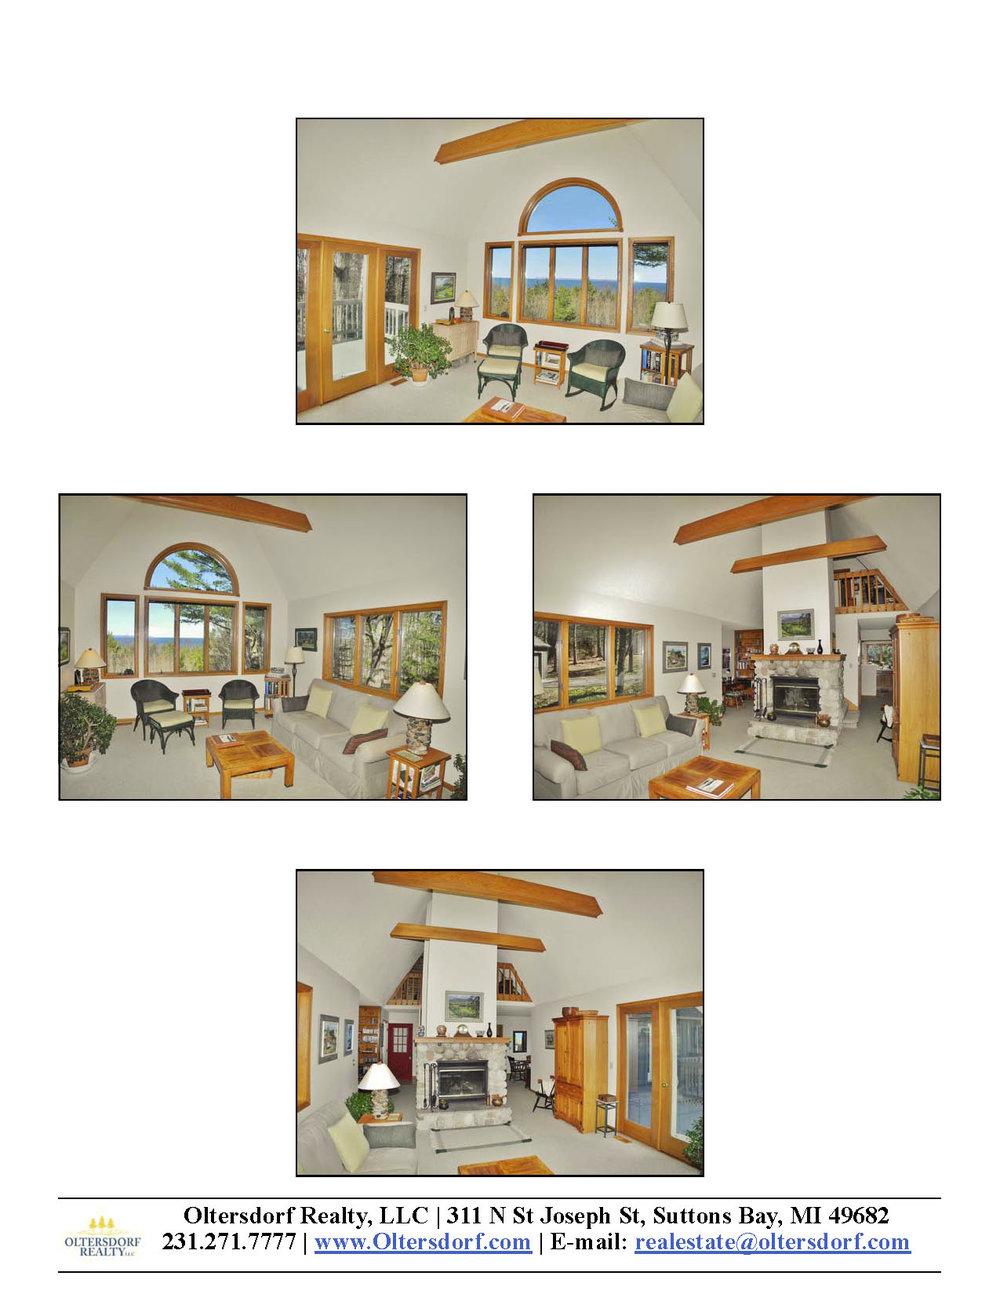 564 S Woodsmoke Drive, Lake Leelanau, MI – Sunset Lake Michigan Water Views - For Sale by Oltersdorf Realty - Marketing Packet (4).jpg